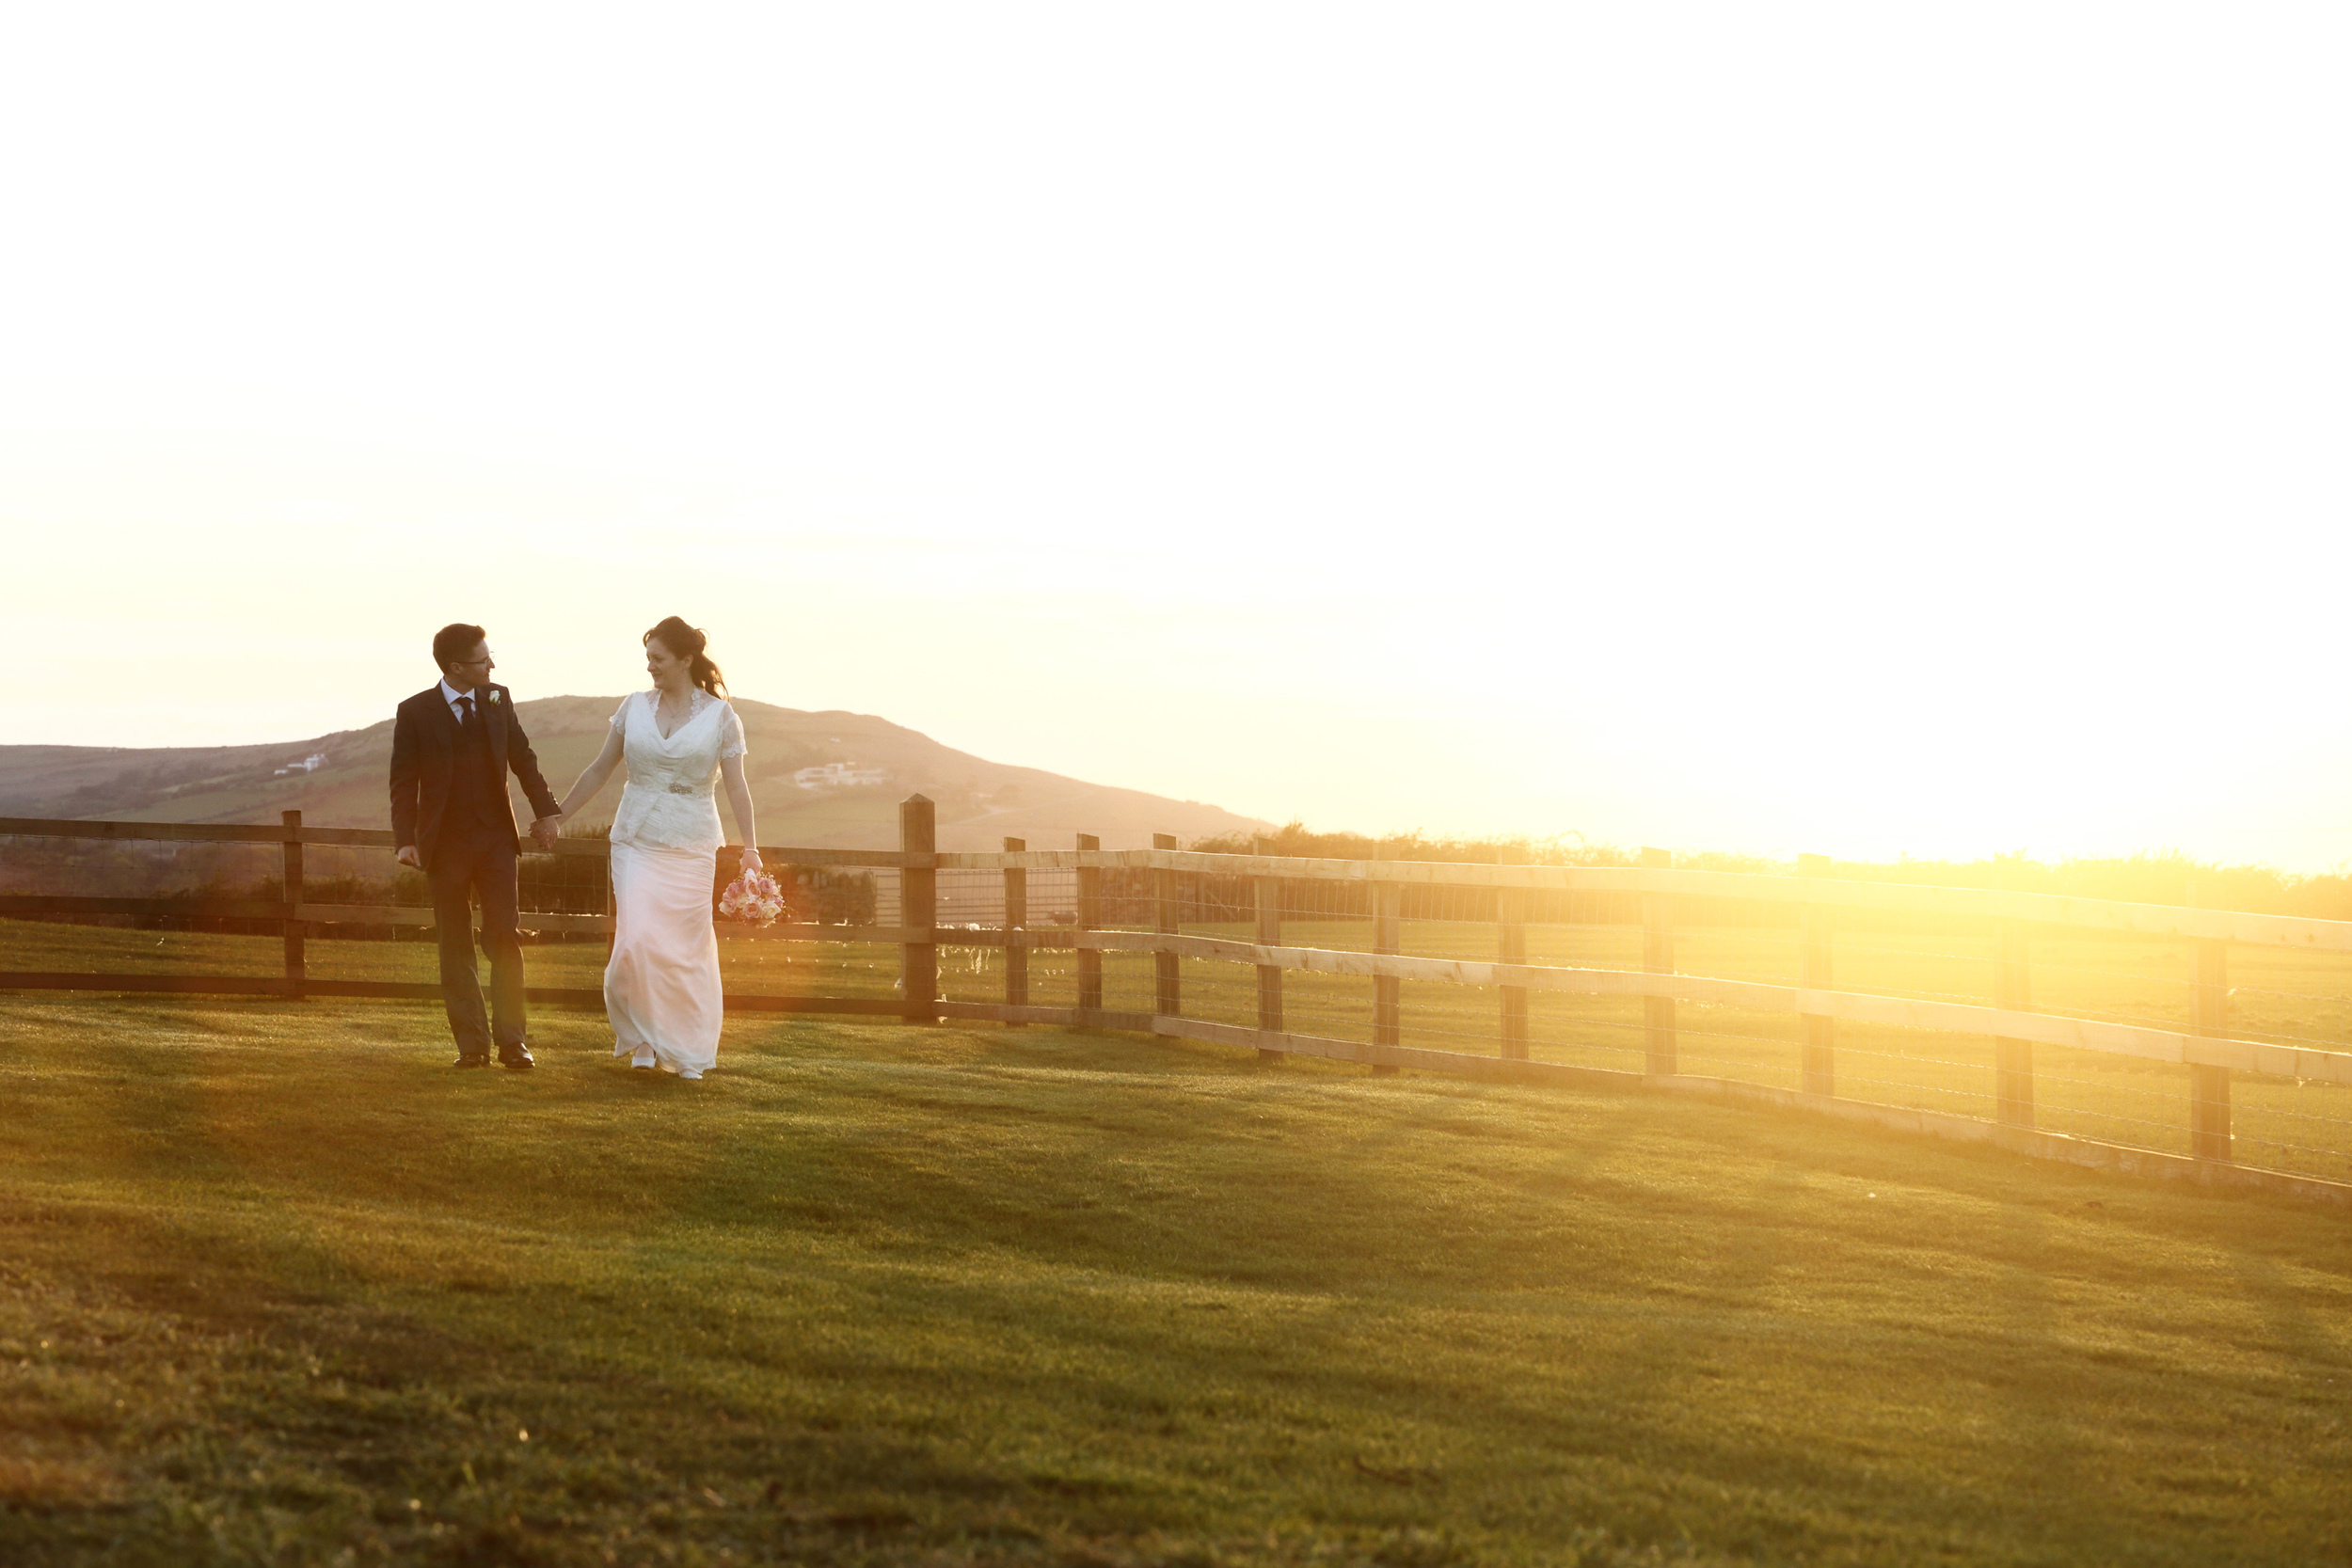 Ocean-View-Gower-Wedding-Photographer-069.JPG